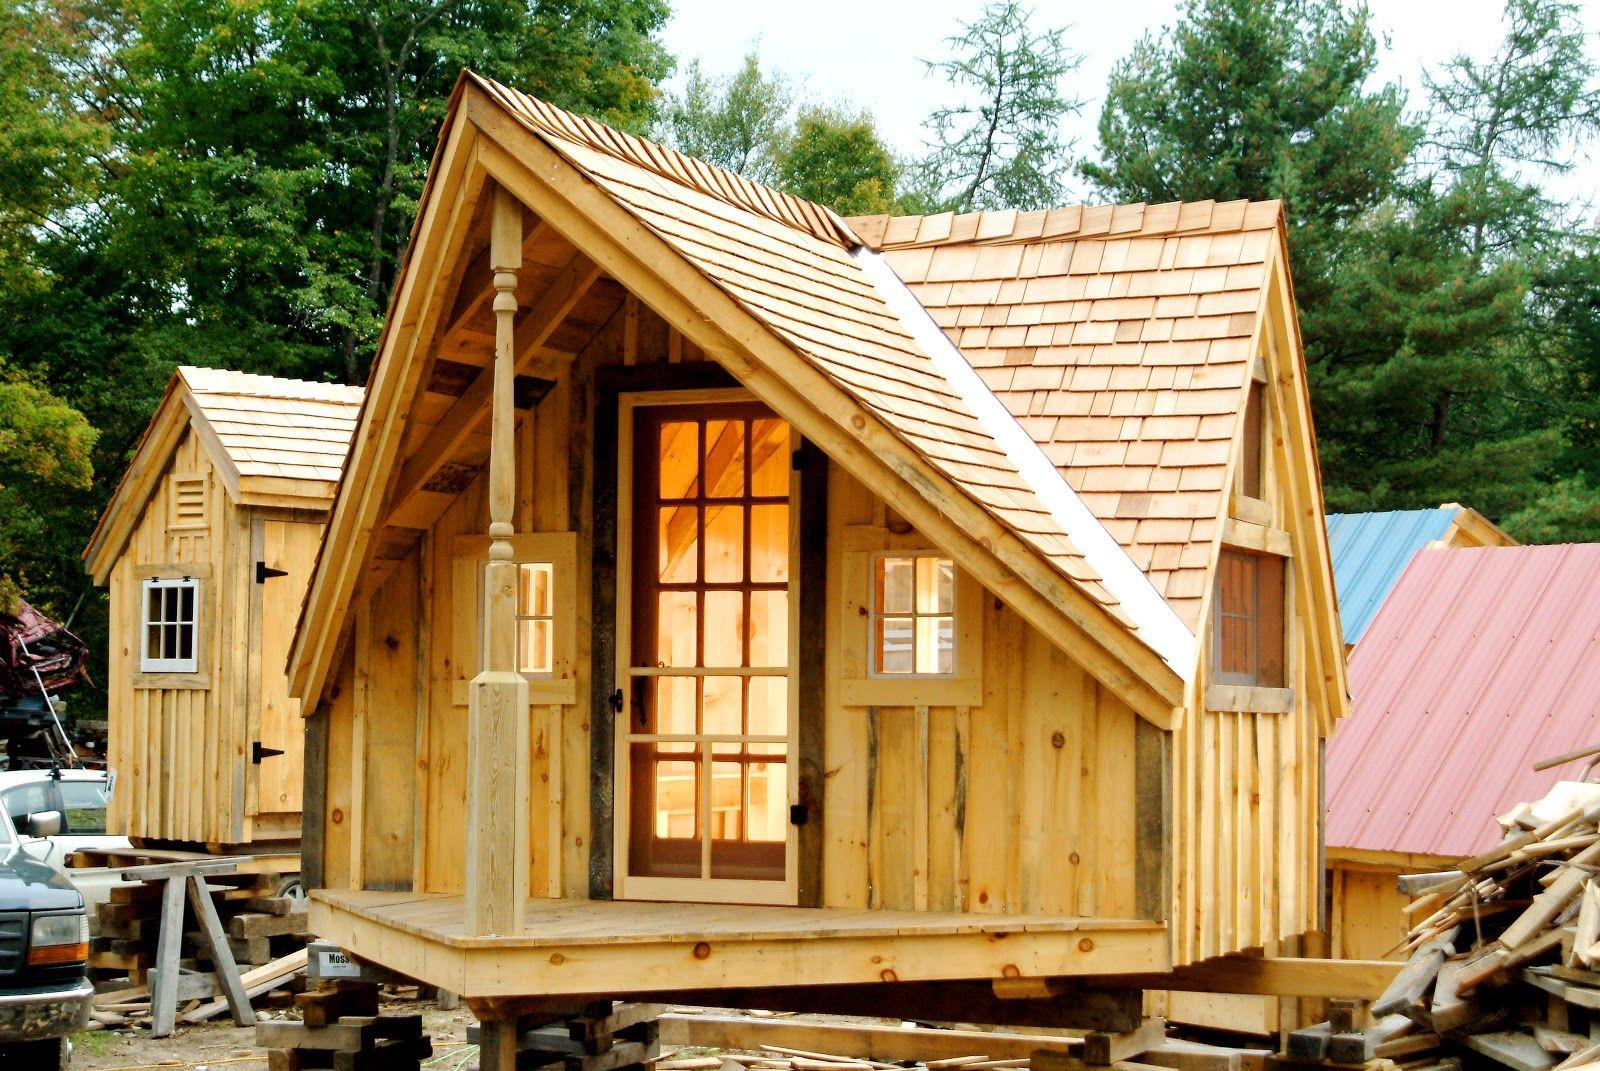 Tree Forts Playhouses | Relaxshacks.com: The Jamaica Cottage Shop ...